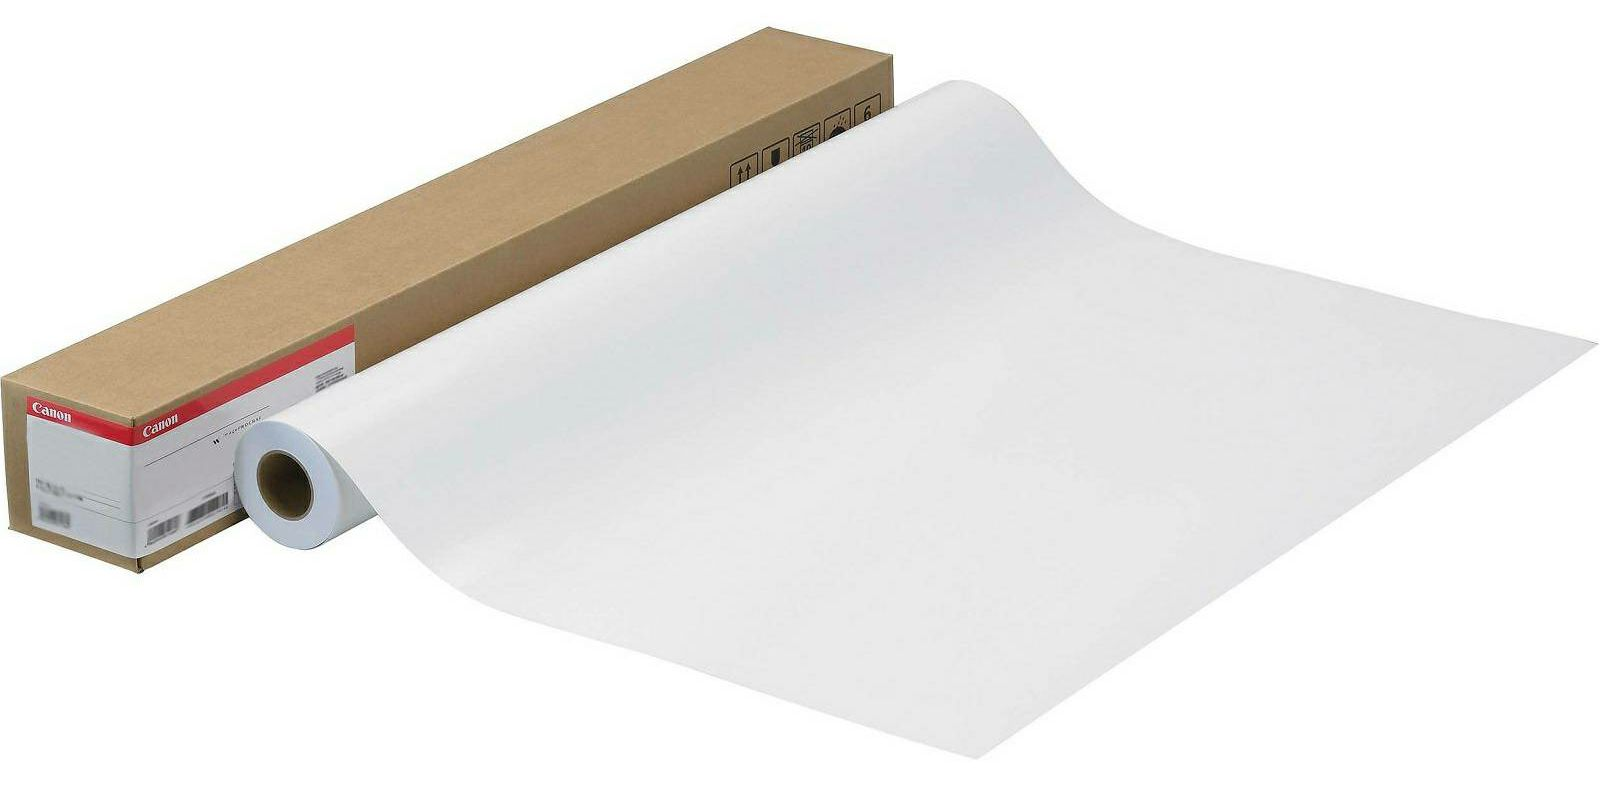 Canon Matt Coated Paper 140gsm 60